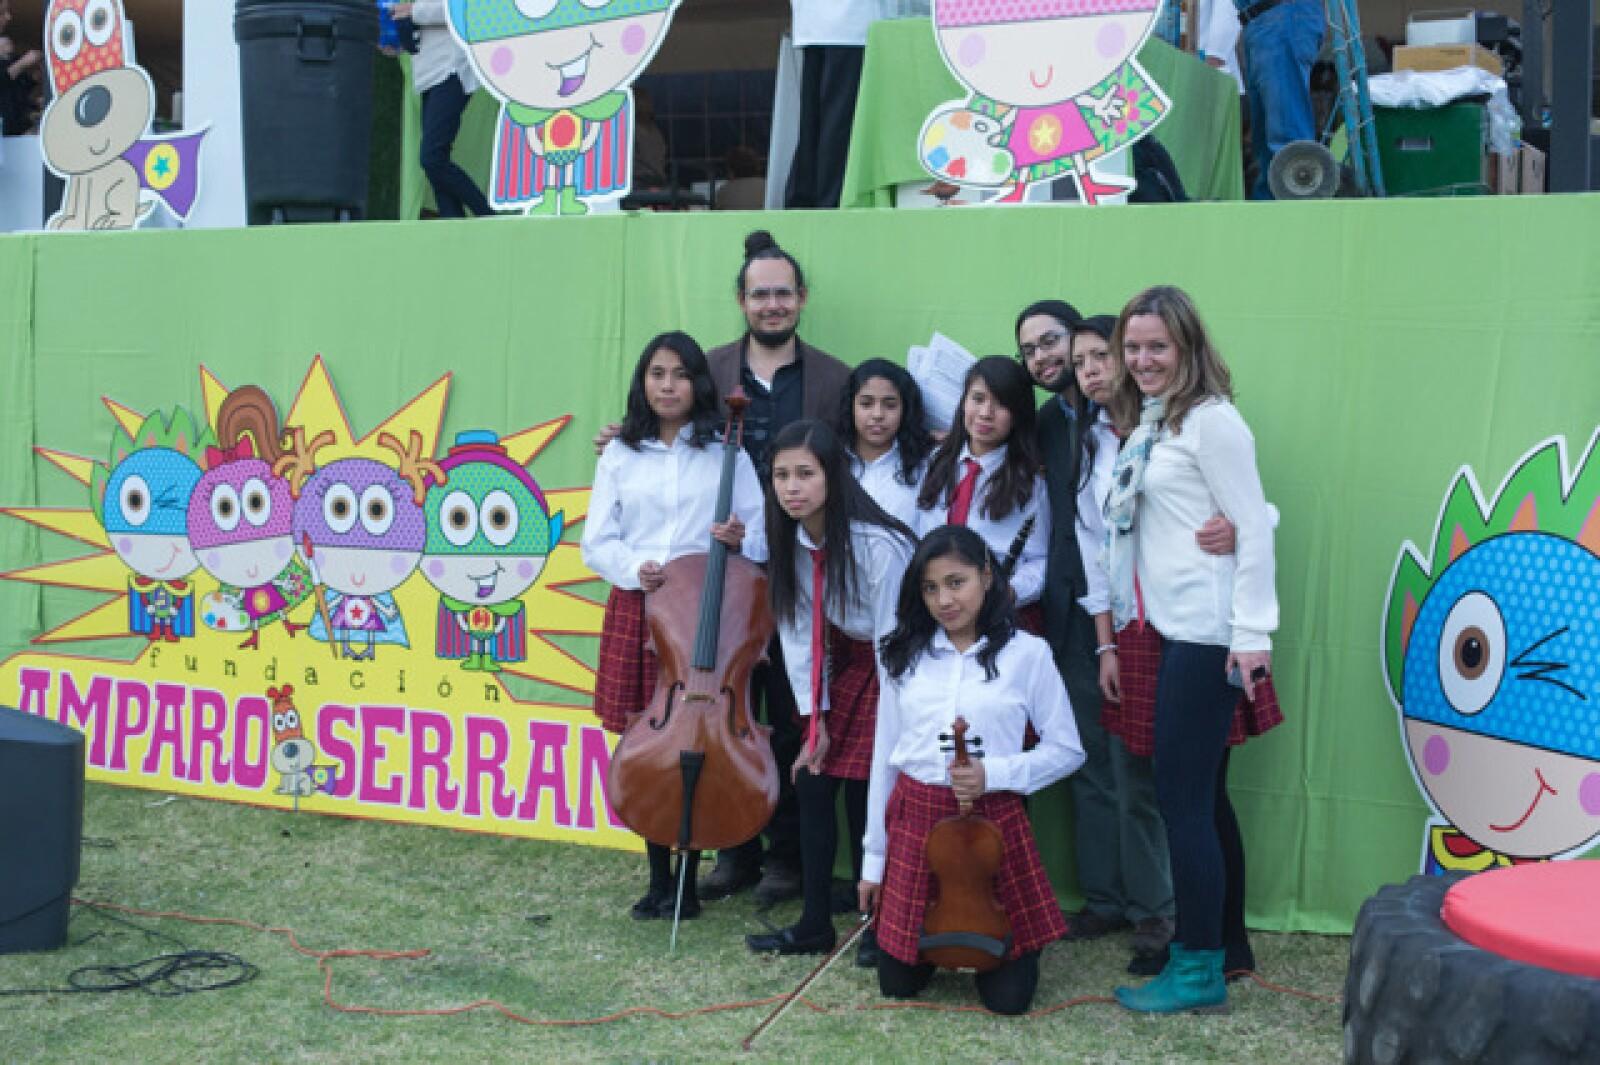 Coro de la fundacion Amparo Serrano